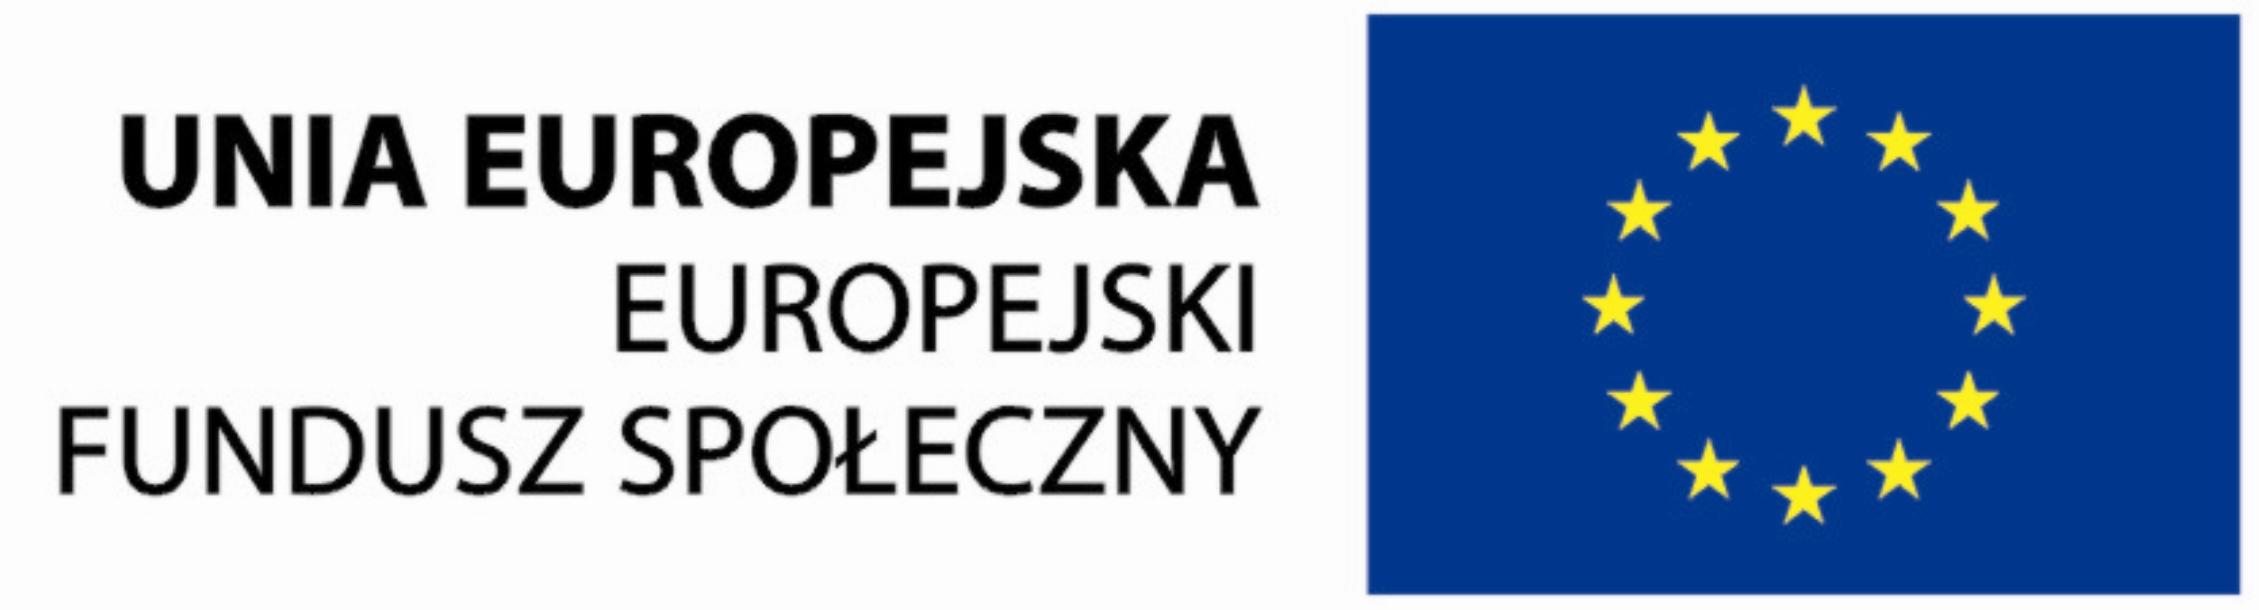 PROJEKT NOWOŚĆ - image unia on http://bqj.com.pl